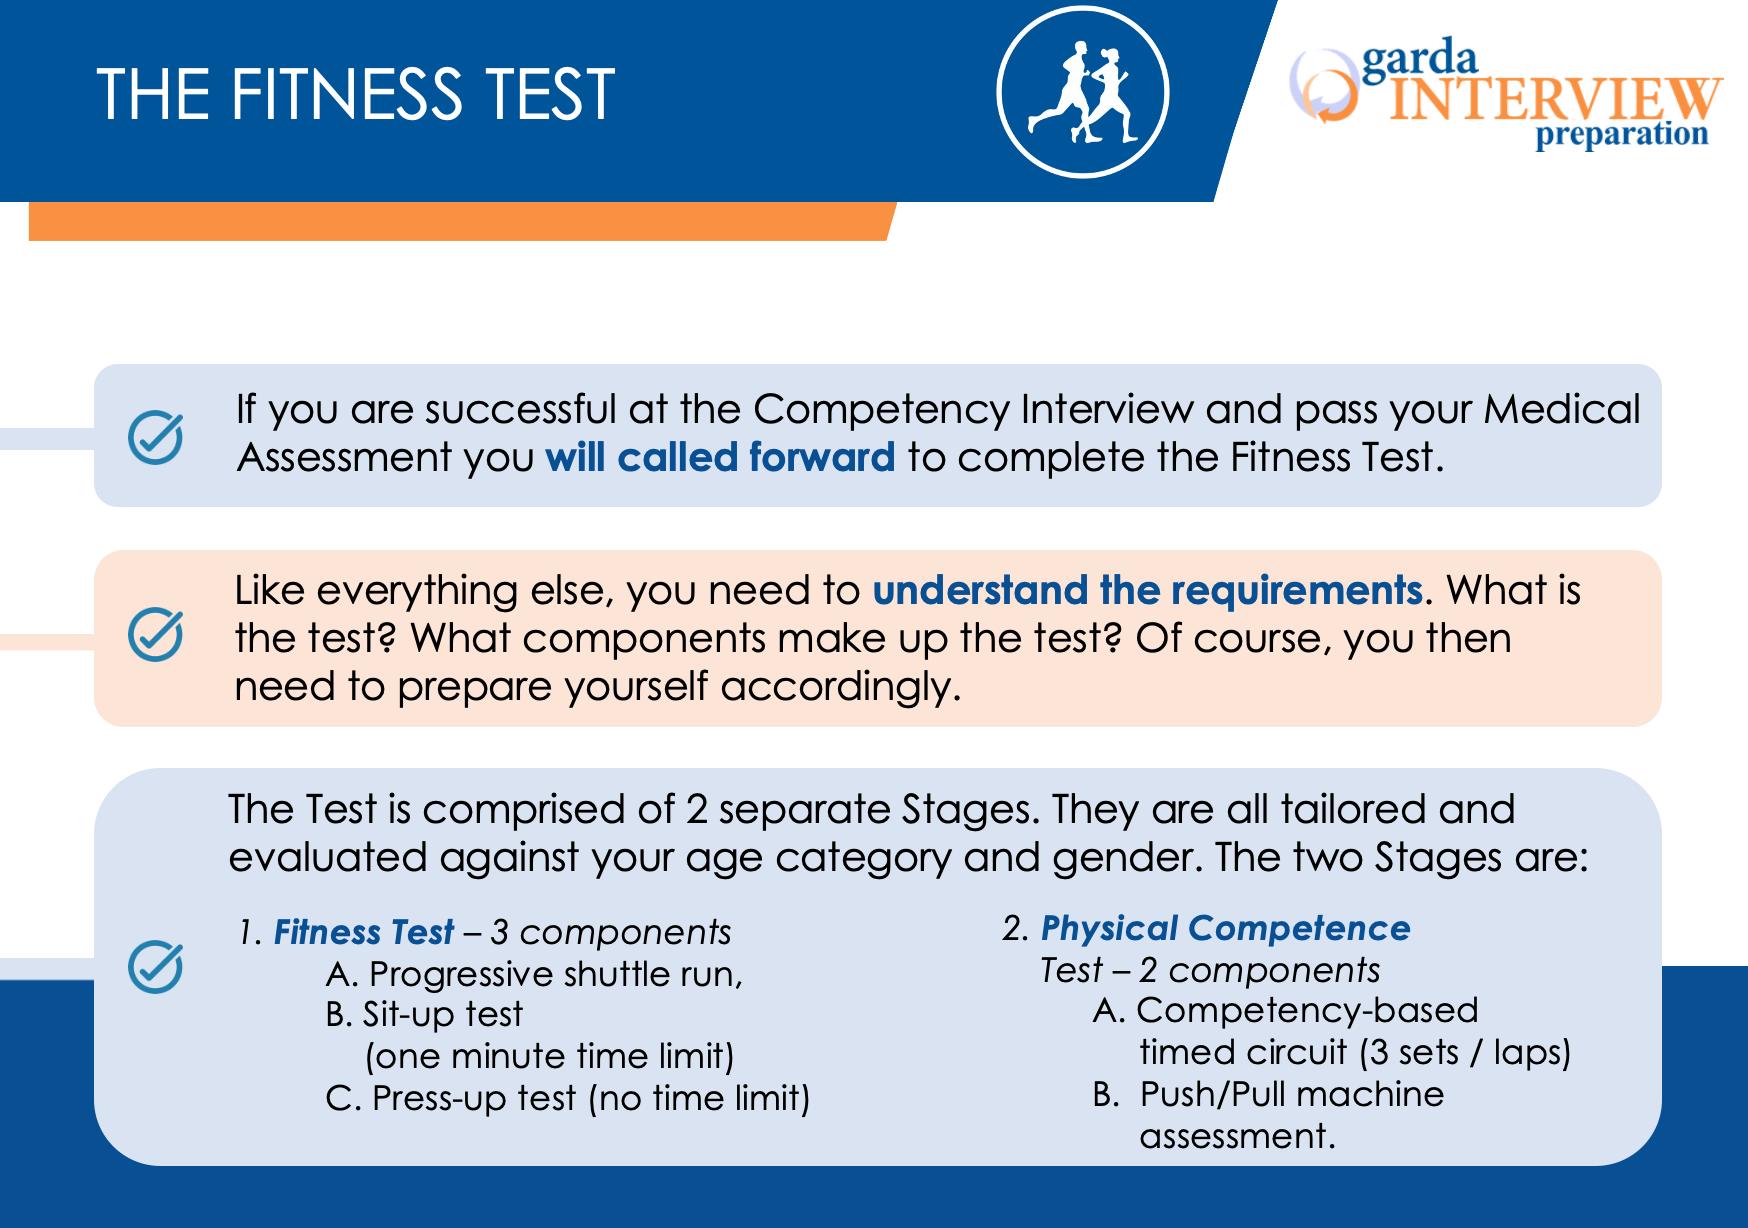 Garda Recruitment 2021 - The Fitness Test